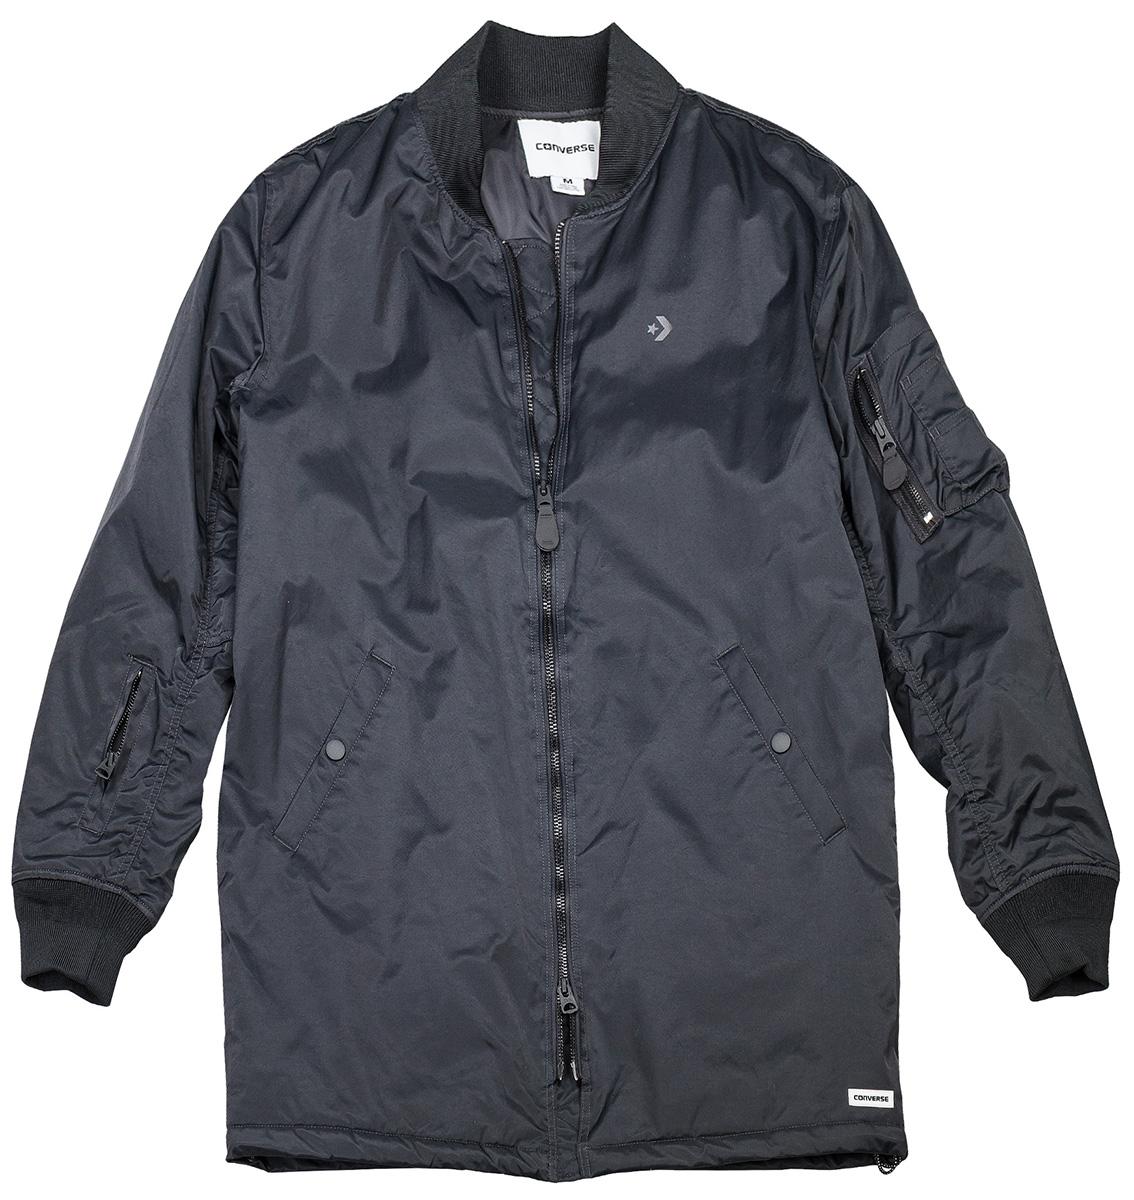 Куртка женская Converse Cons Varsity Coaches Jacket, цвет: черный. 10005114001. Размер M (48)10005114001